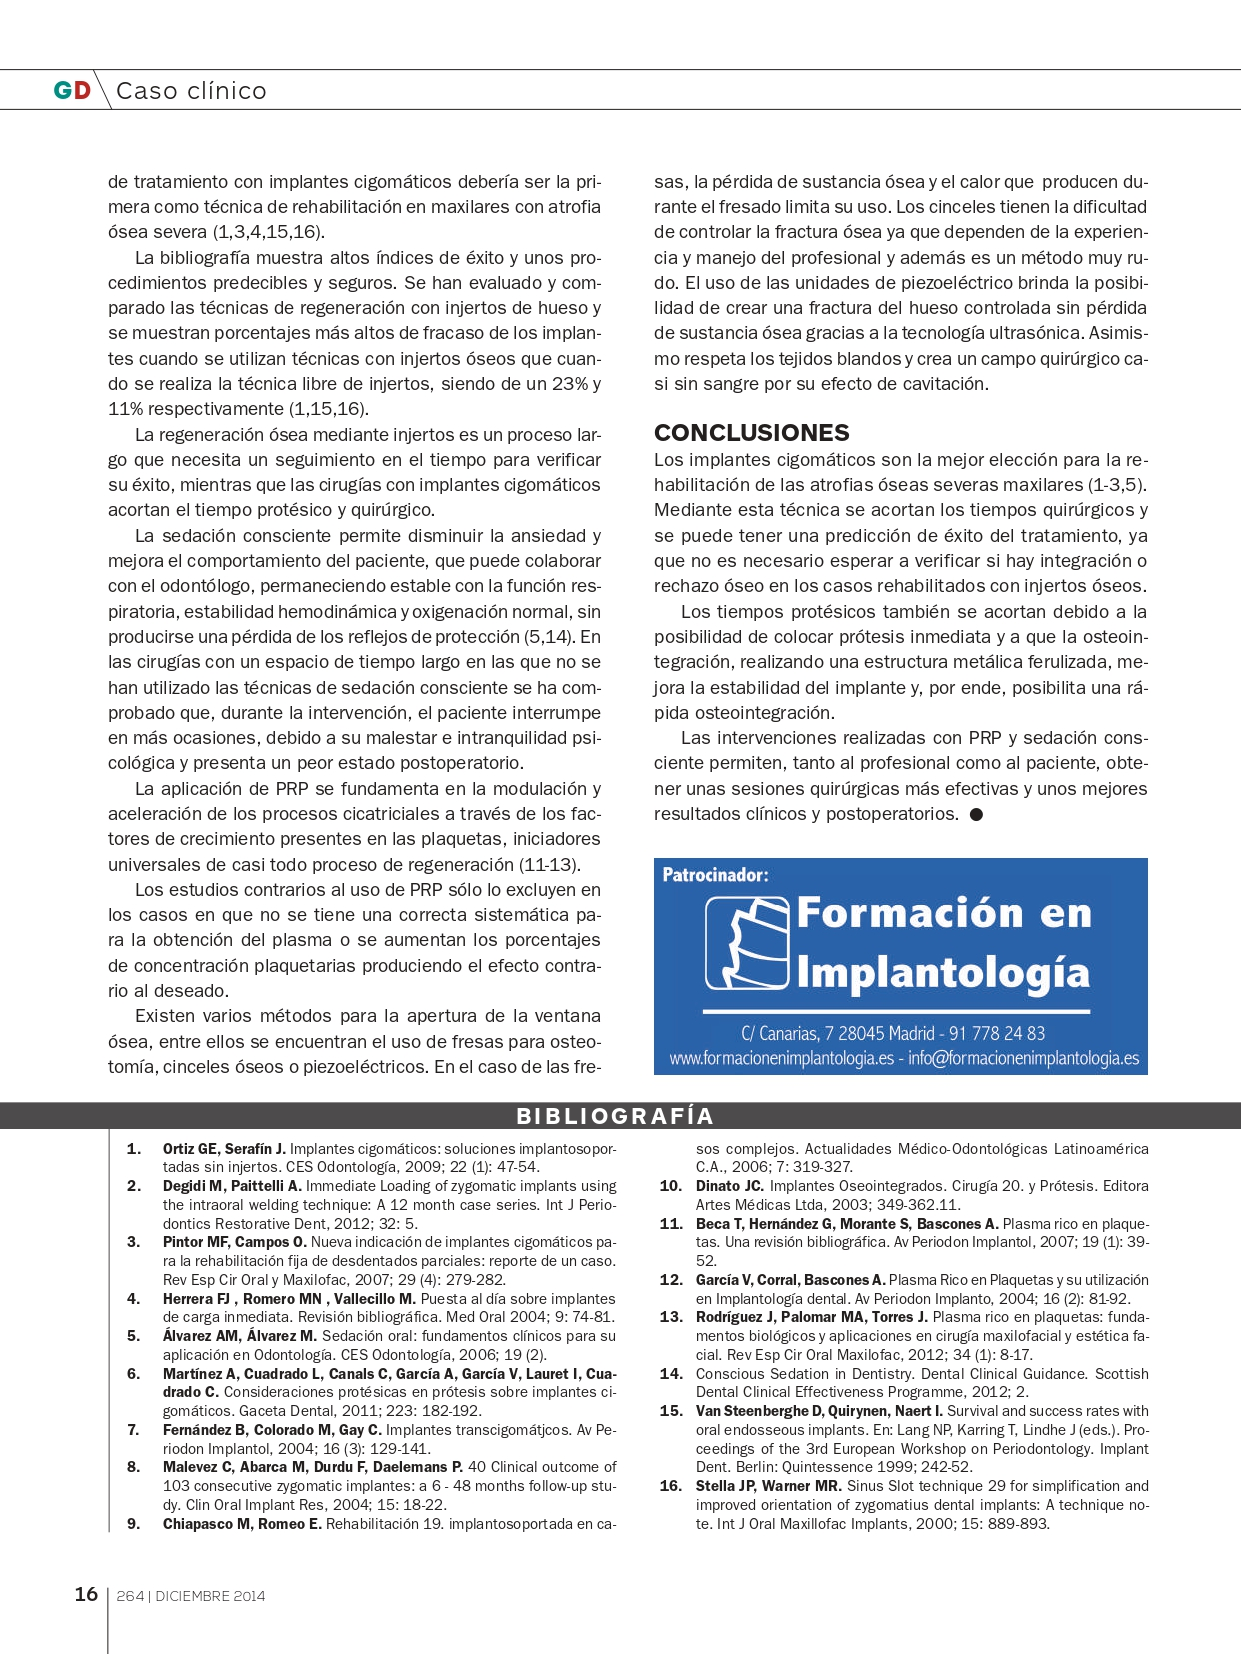 Rehabilitación-maxilar-completa-con-reabsorción-ósea-mediante-4-implantes-cigomáticos_page-0009